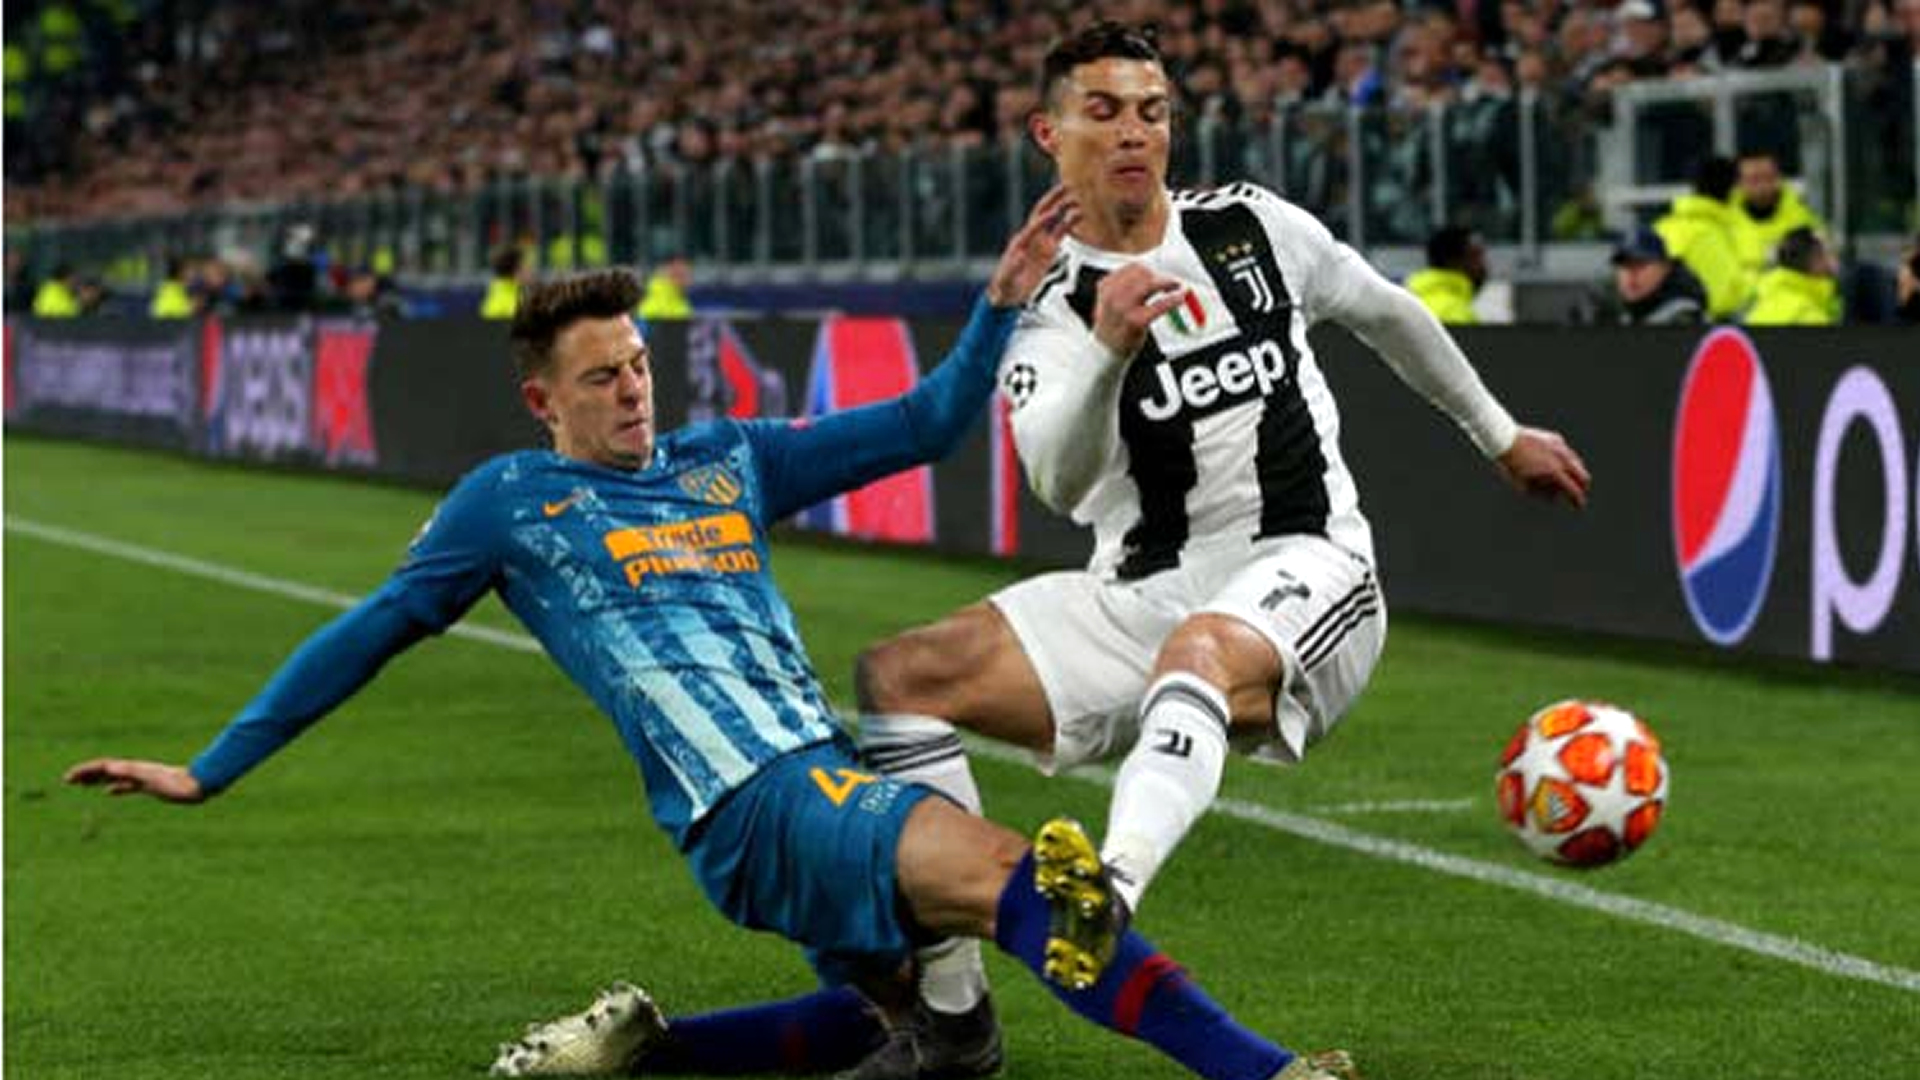 Santiago Arias Cristiano Ronaldo Juventus Atletico Champions League 12032019